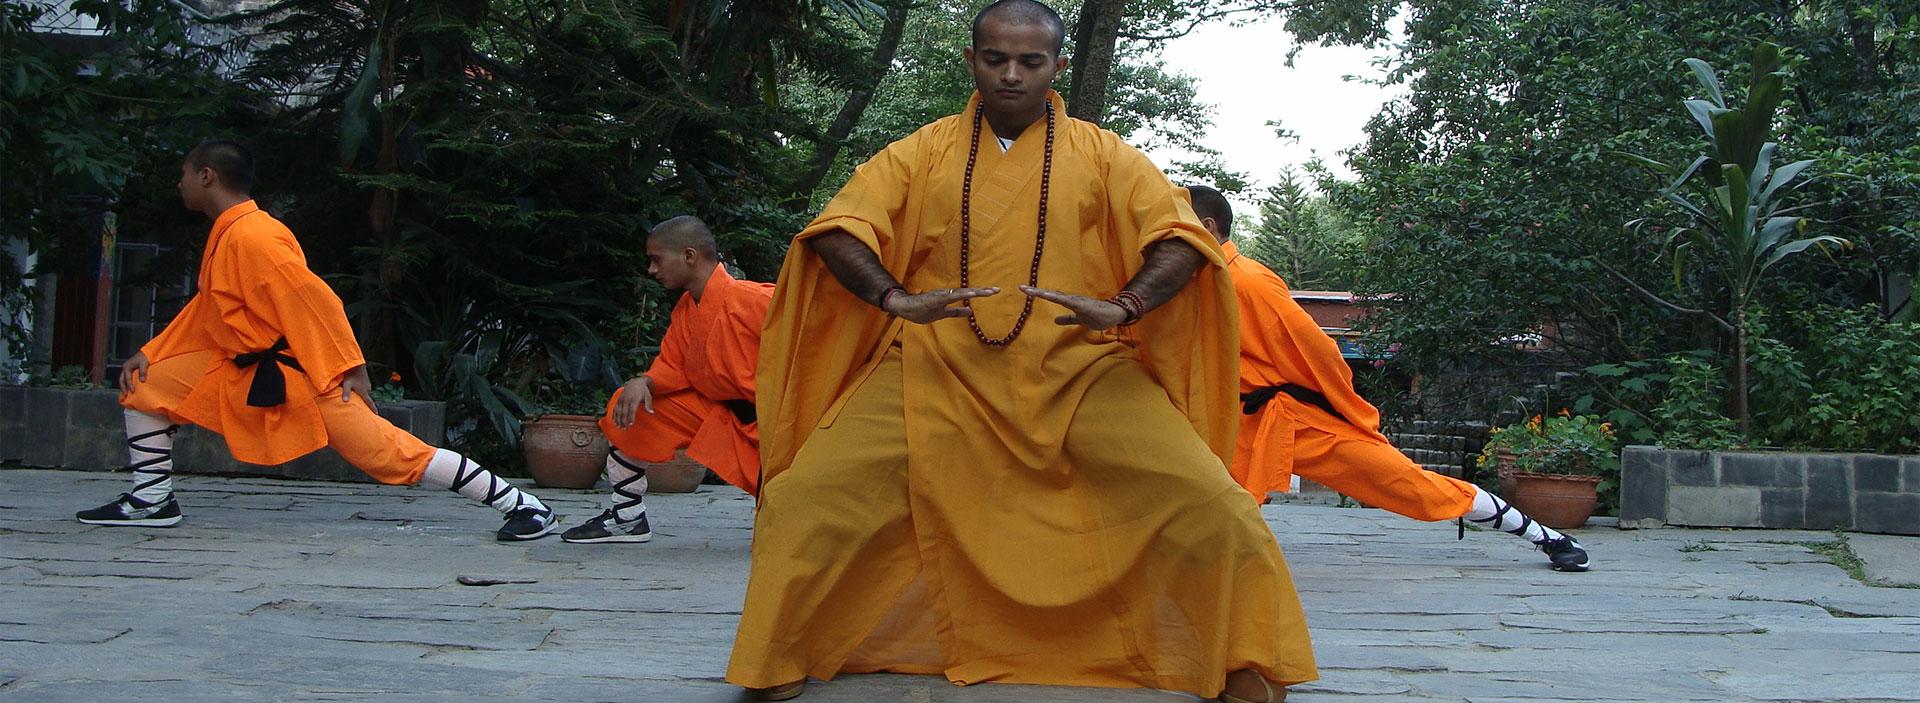 Shaolin India Kung fu classes | Shifu Kanishka | Martialarts